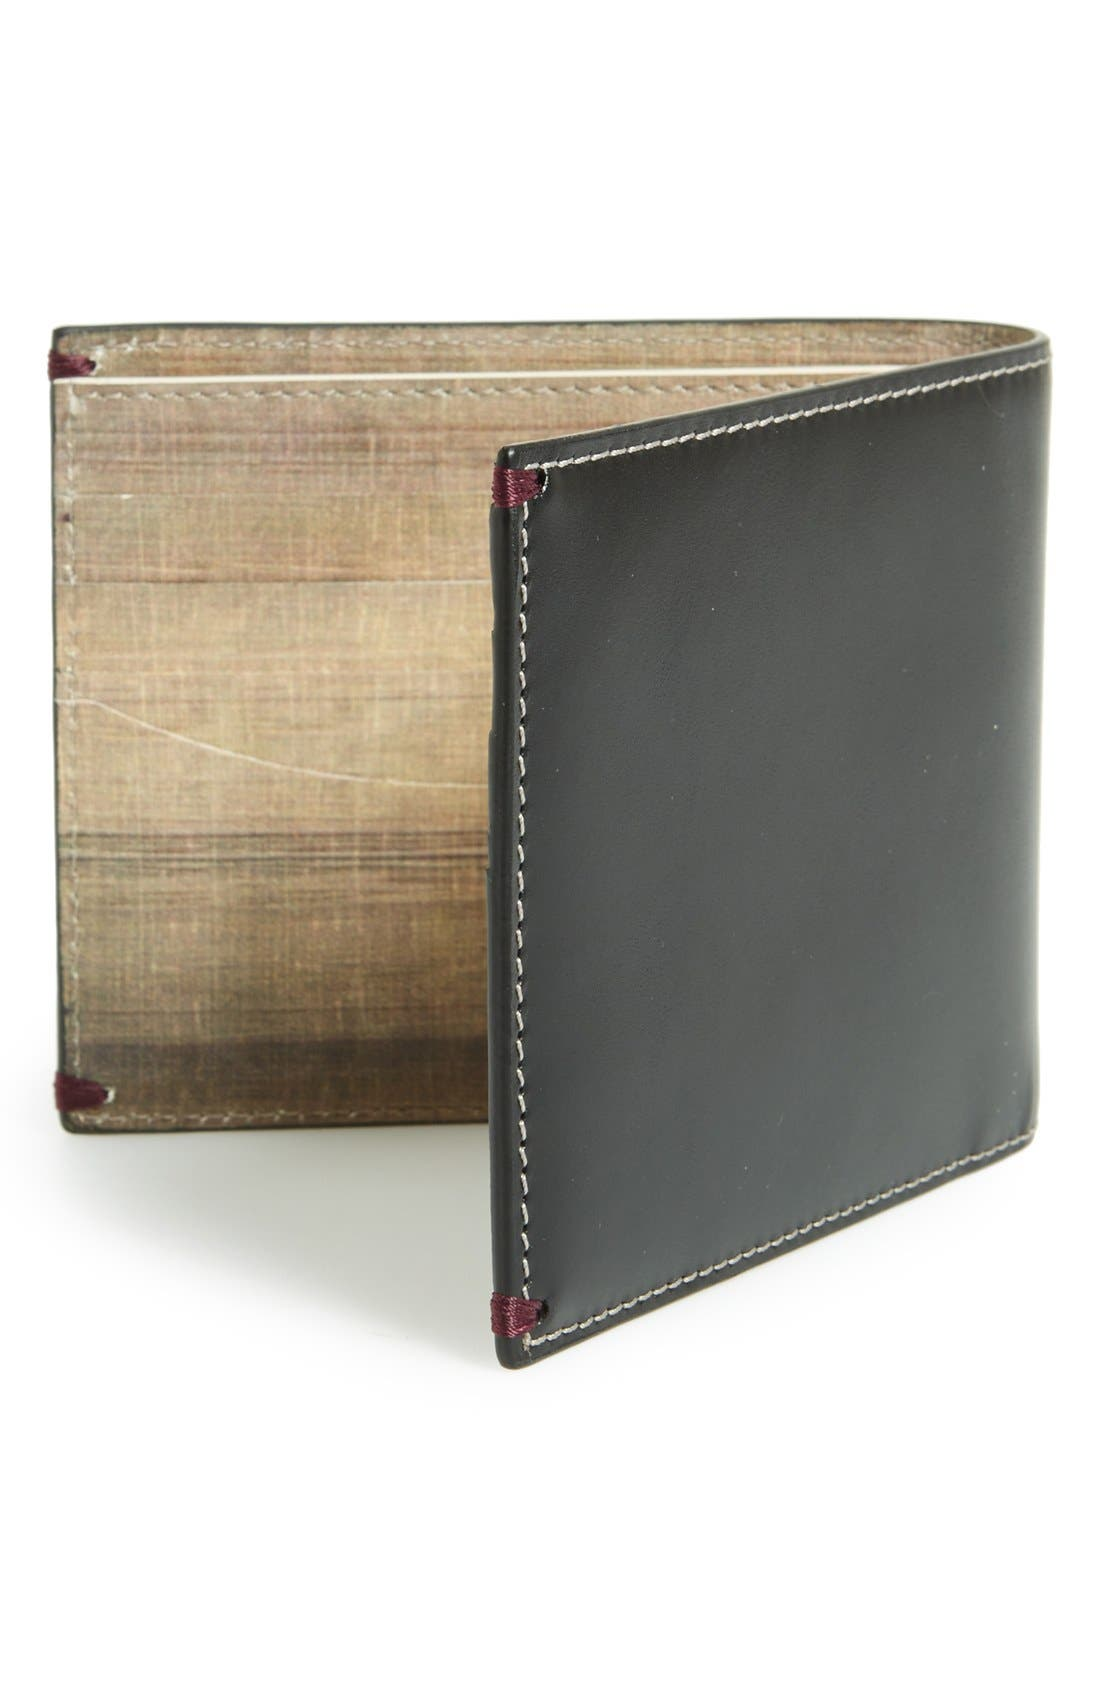 PAUL SMITH,                             'Mini Through Door' Billfold Wallet,                             Alternate thumbnail 3, color,                             001